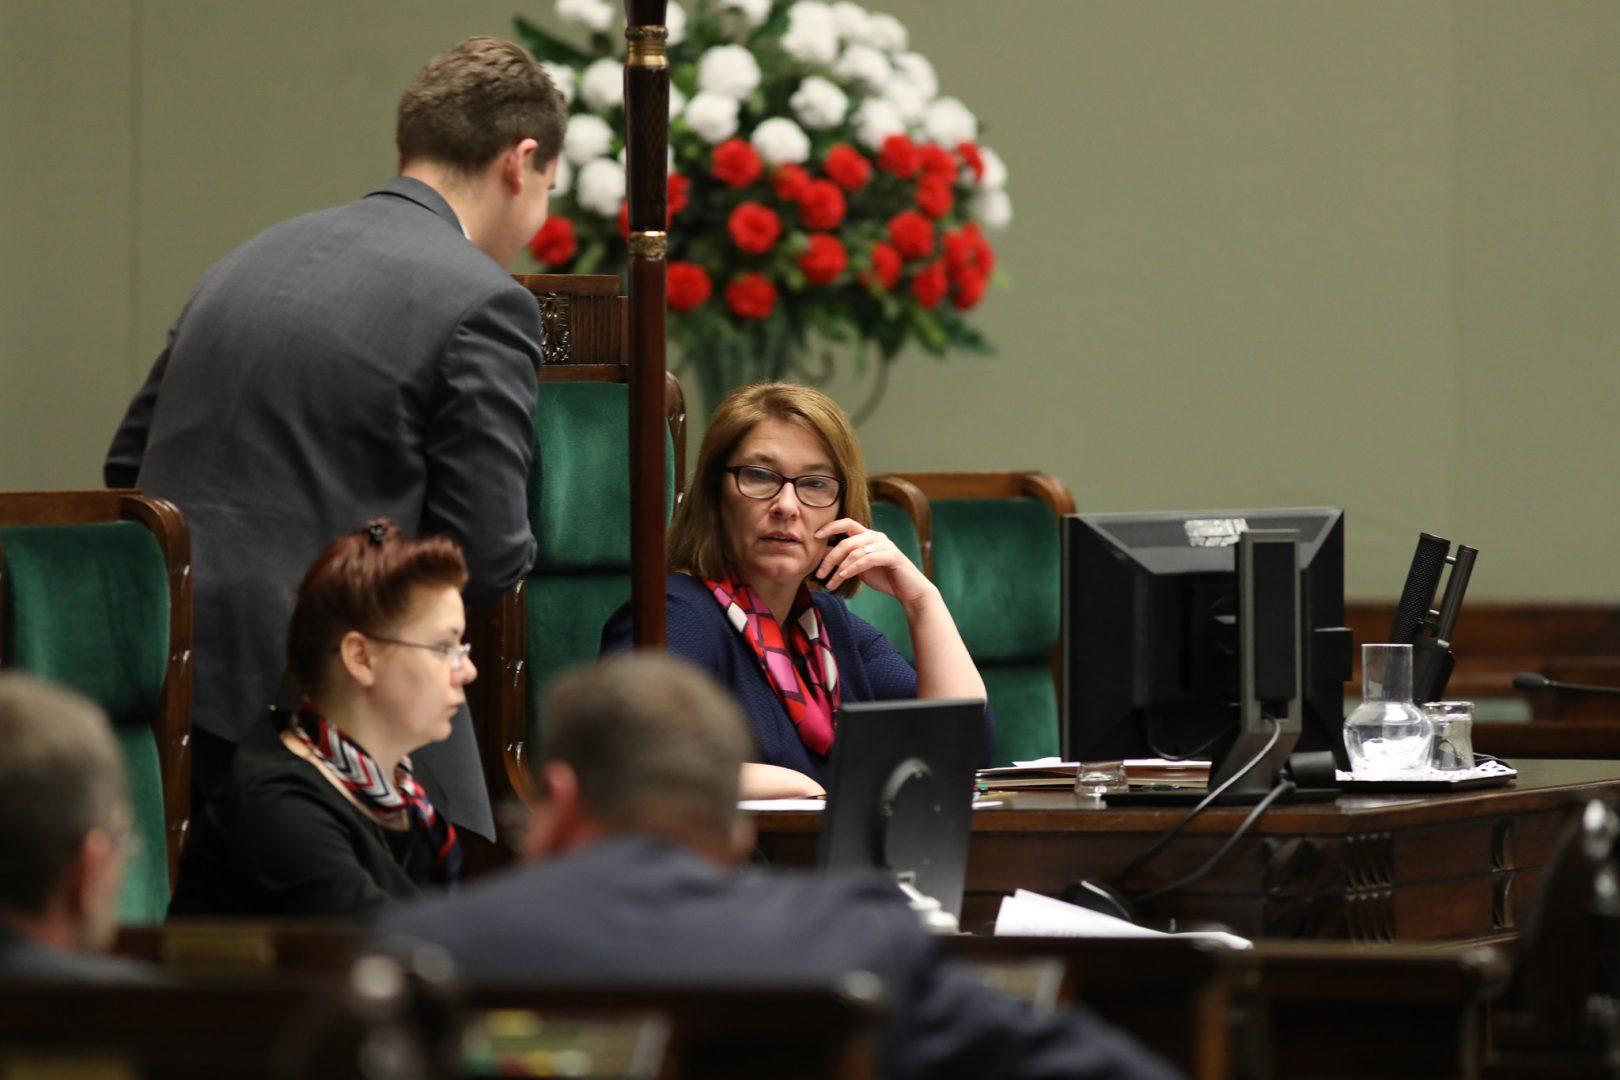 Beata Mazurek/fot. Kancelaria Sejmu/Rafał Zambrzycki